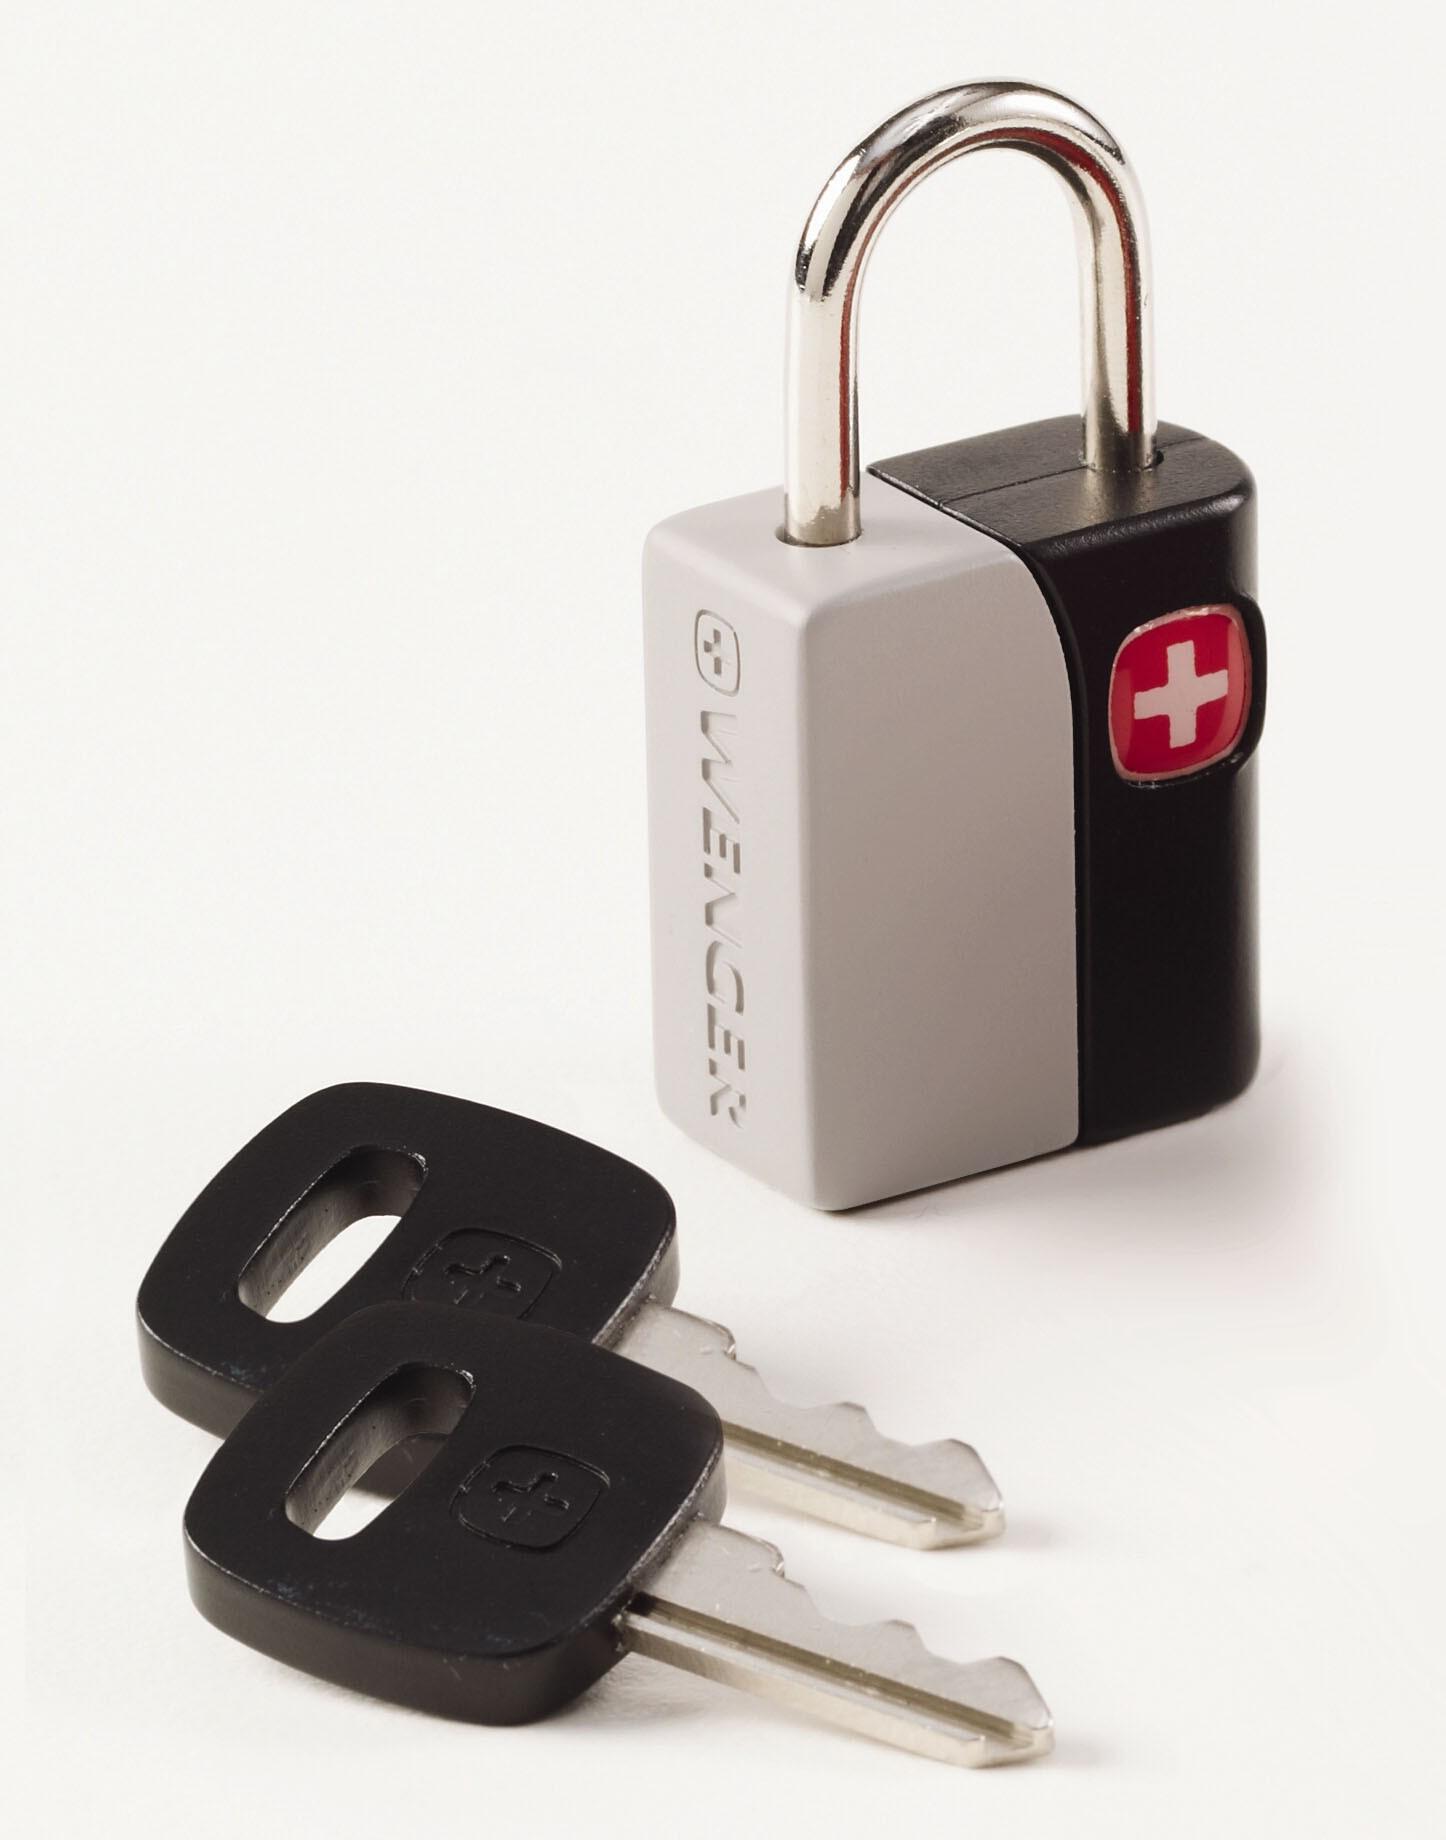 Wenger Key Lock in Grey